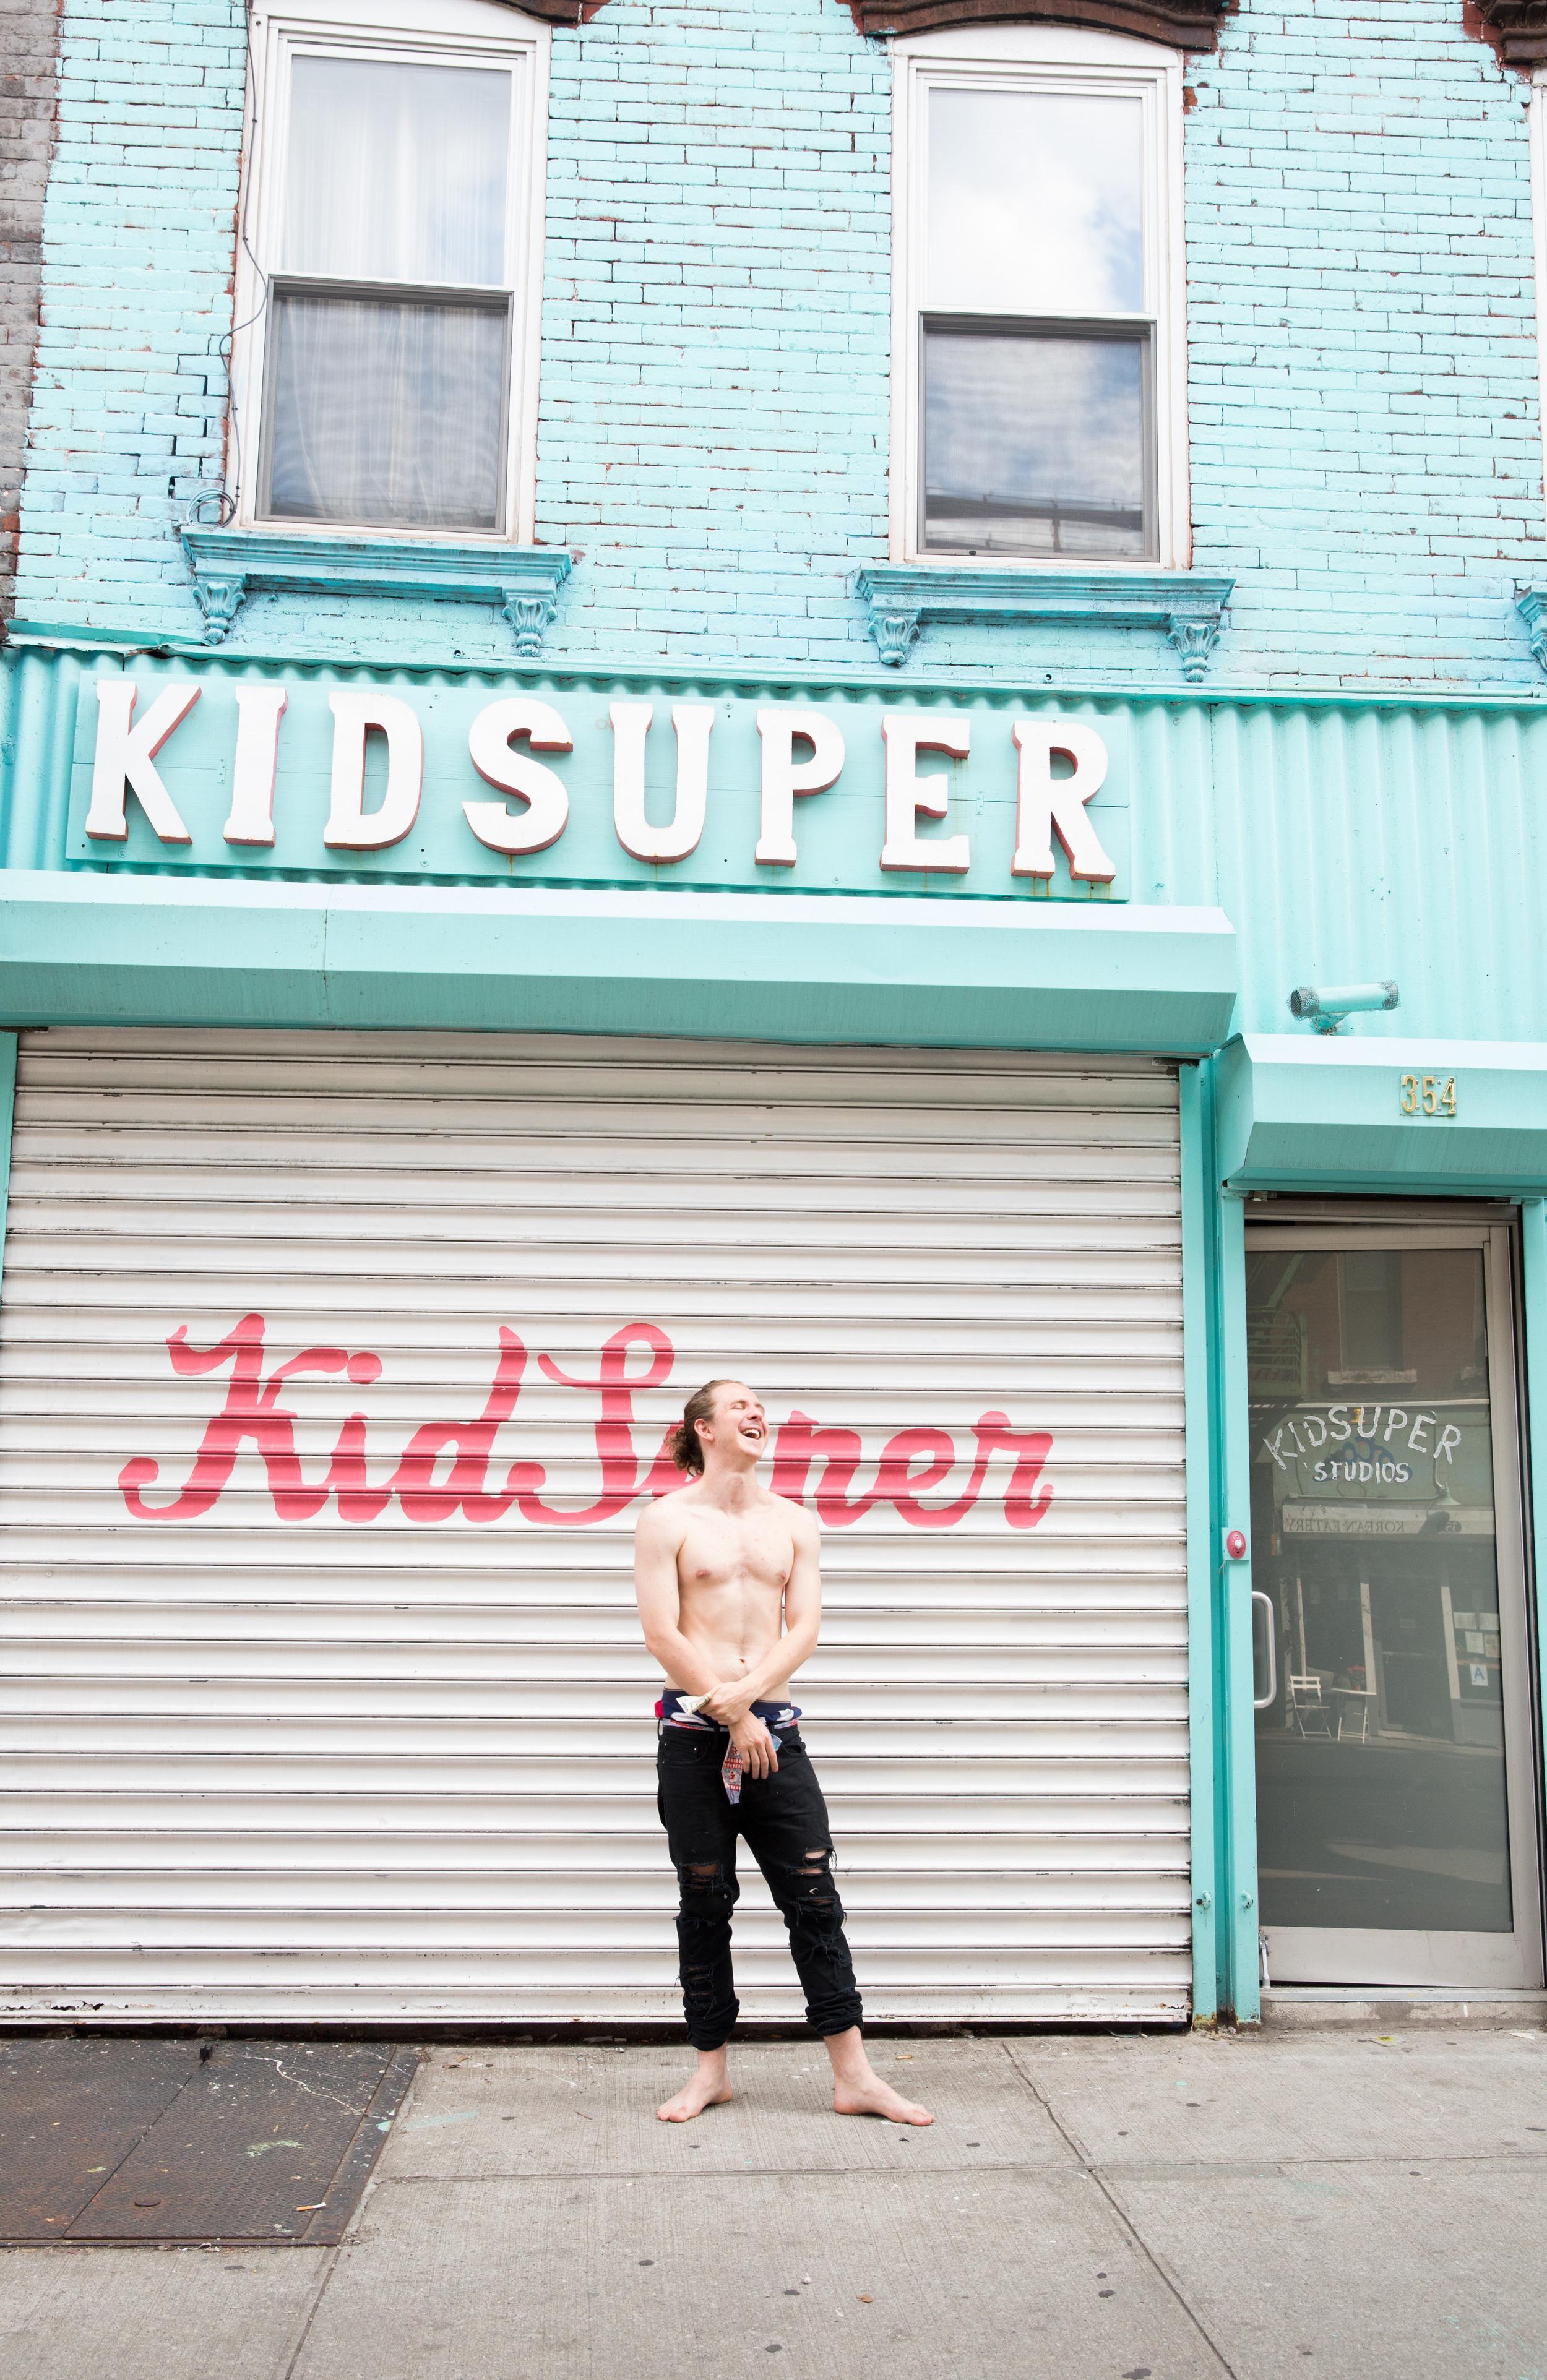 KIDSUPER